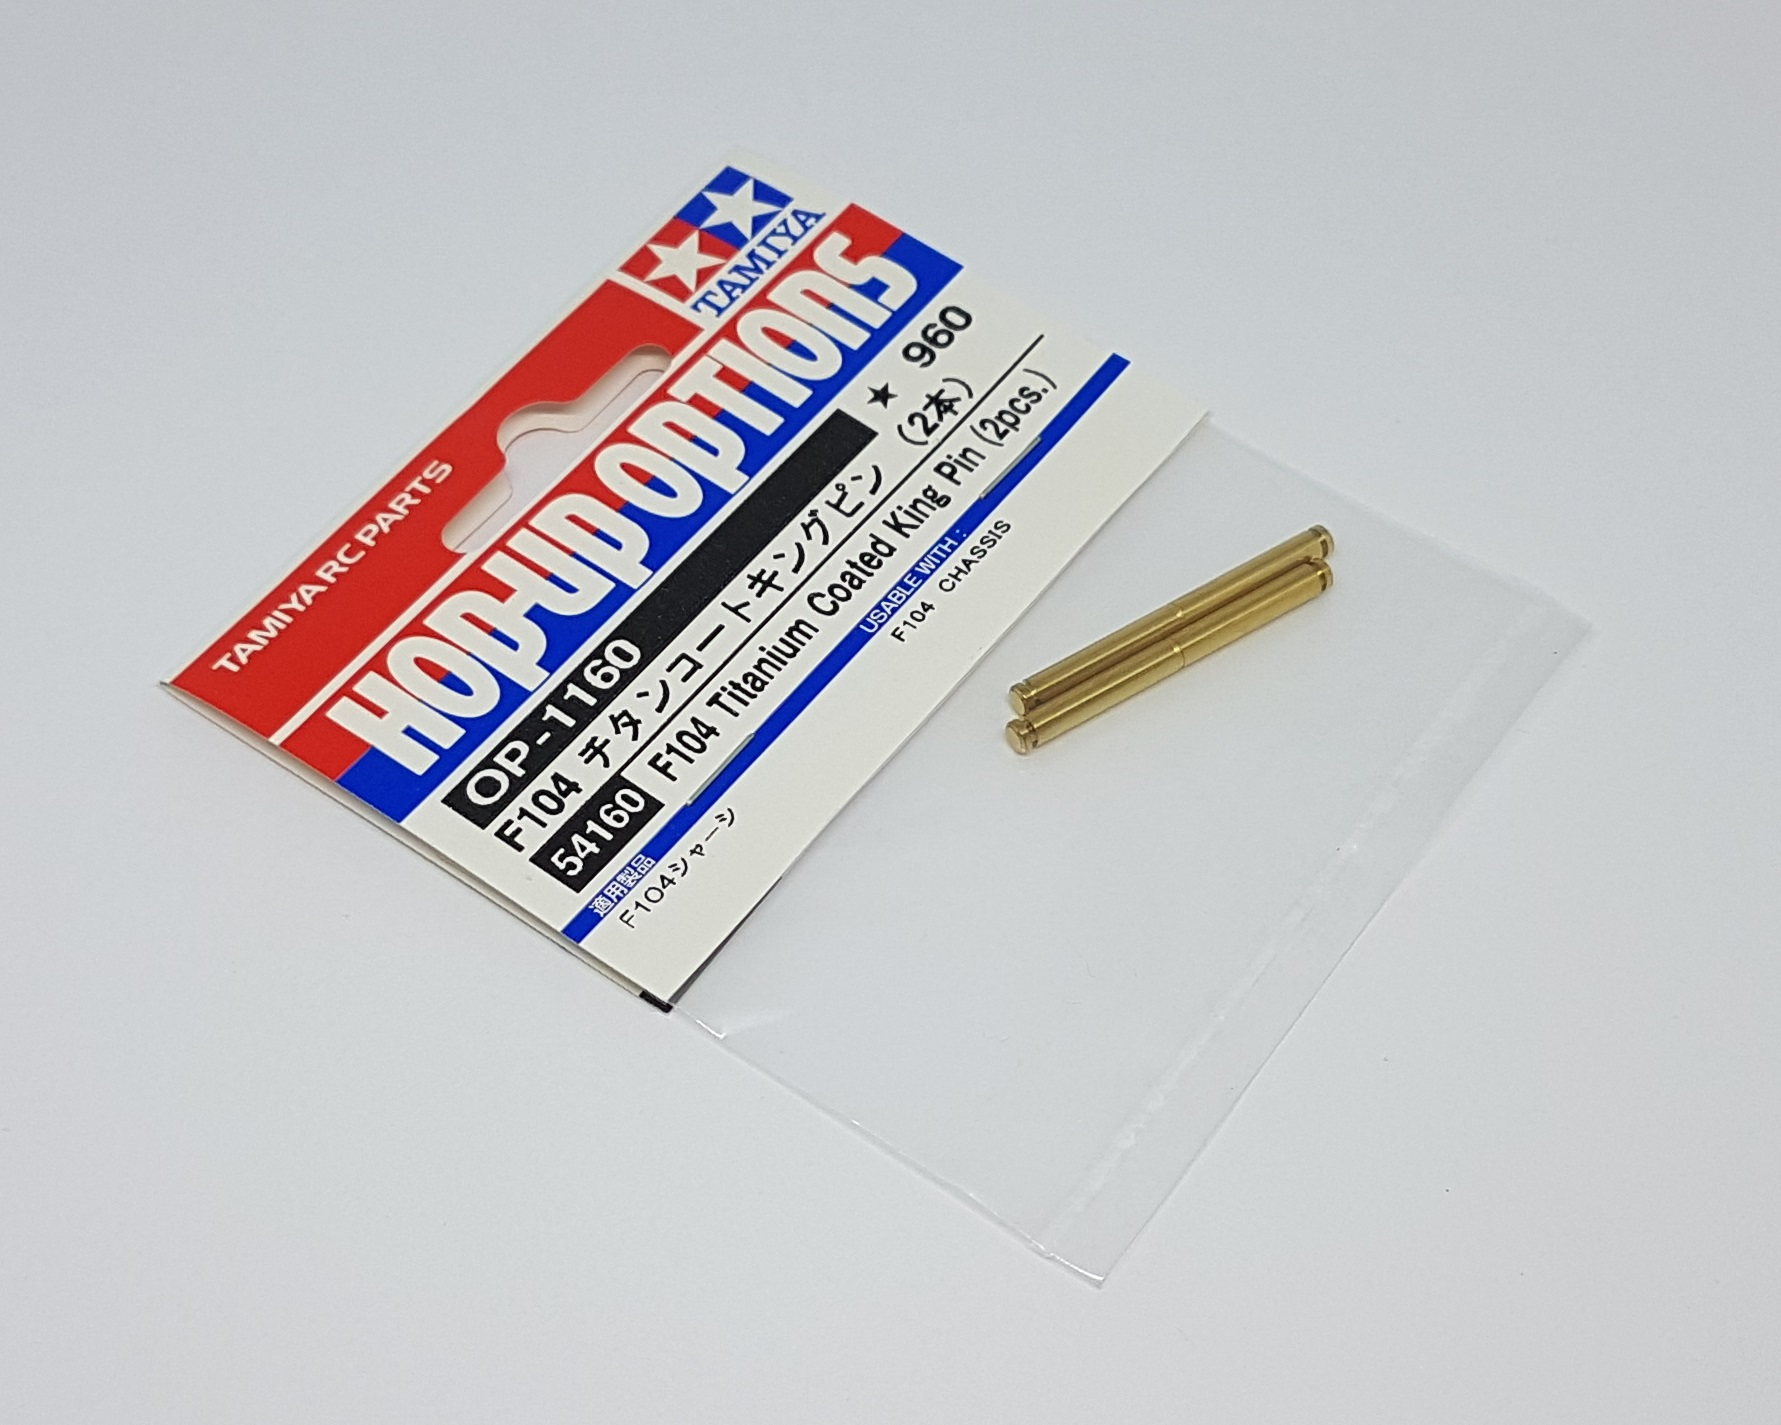 54160 -Tamiya 54160 F104 Titanium Coated King Pin (2pcs) For F104 / Pro F104X1 F104 VII